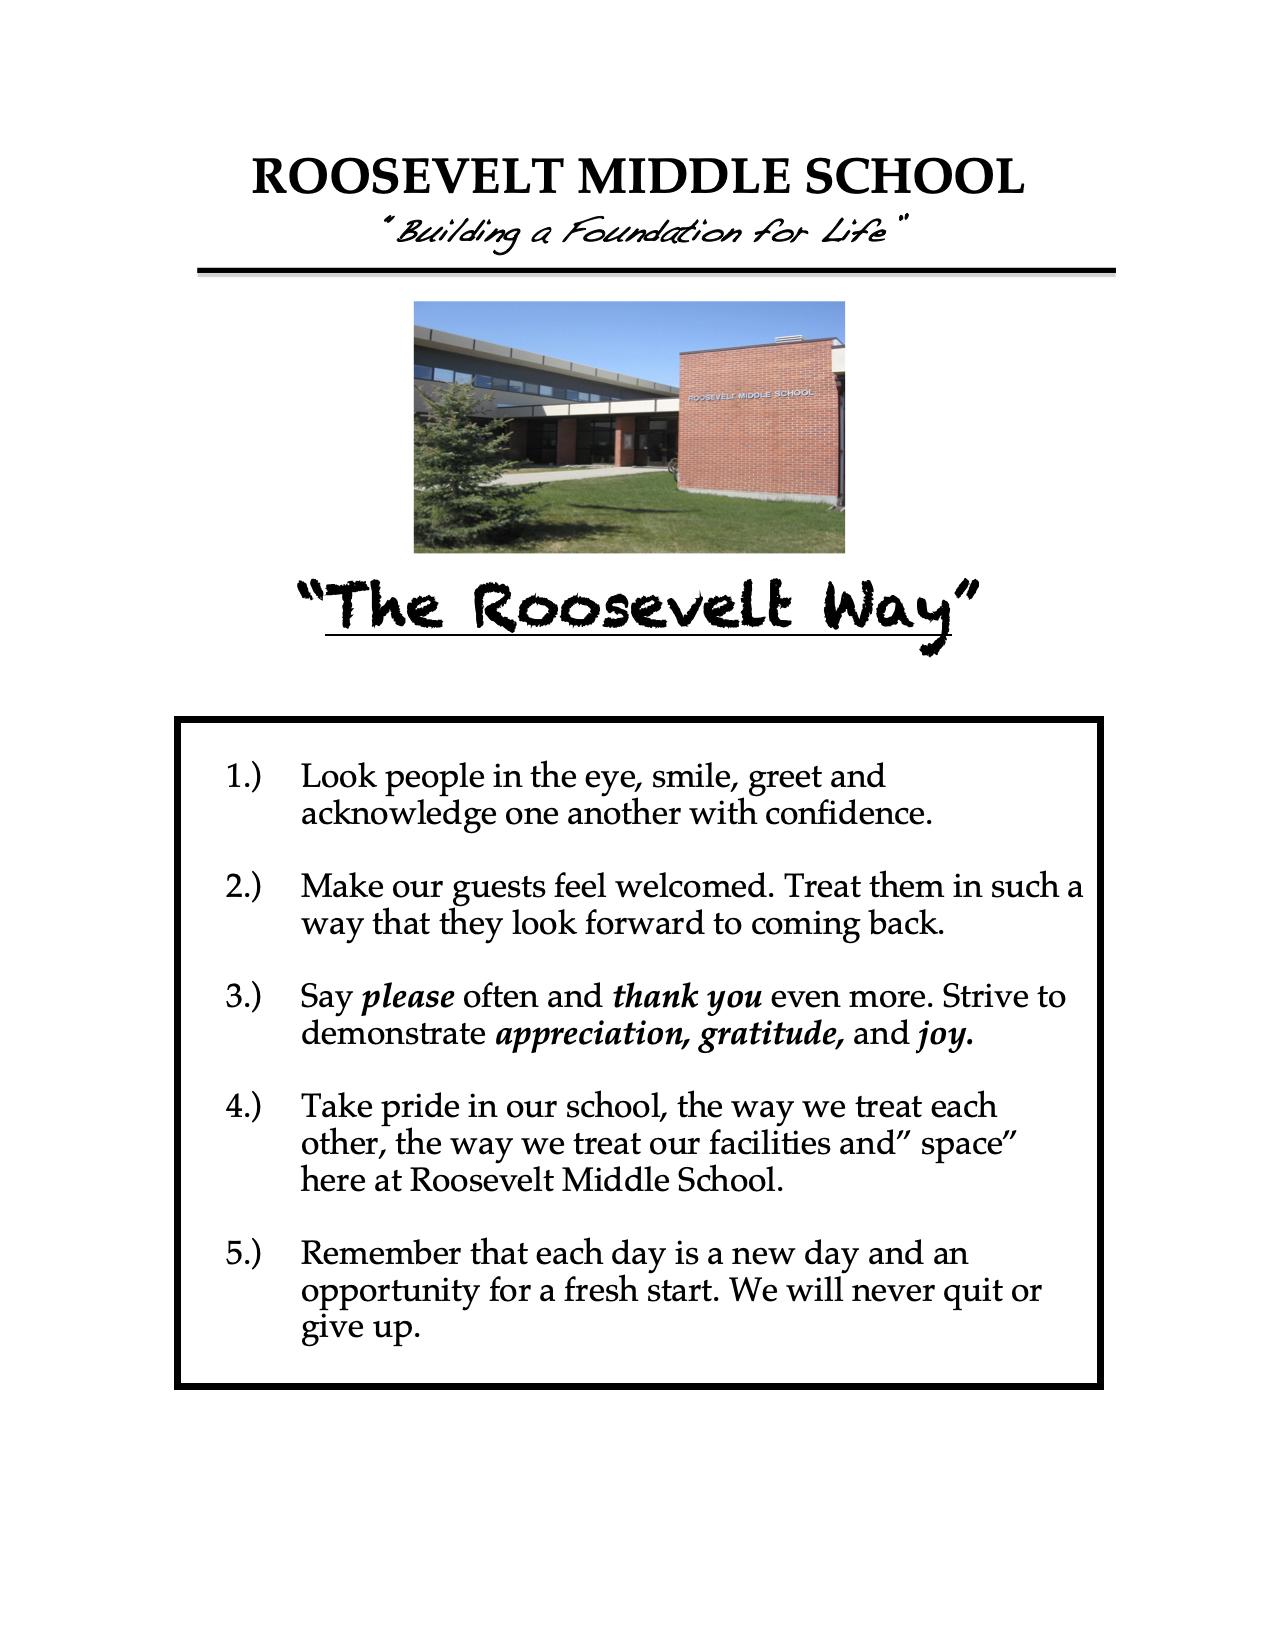 Roosevelt Way graphic